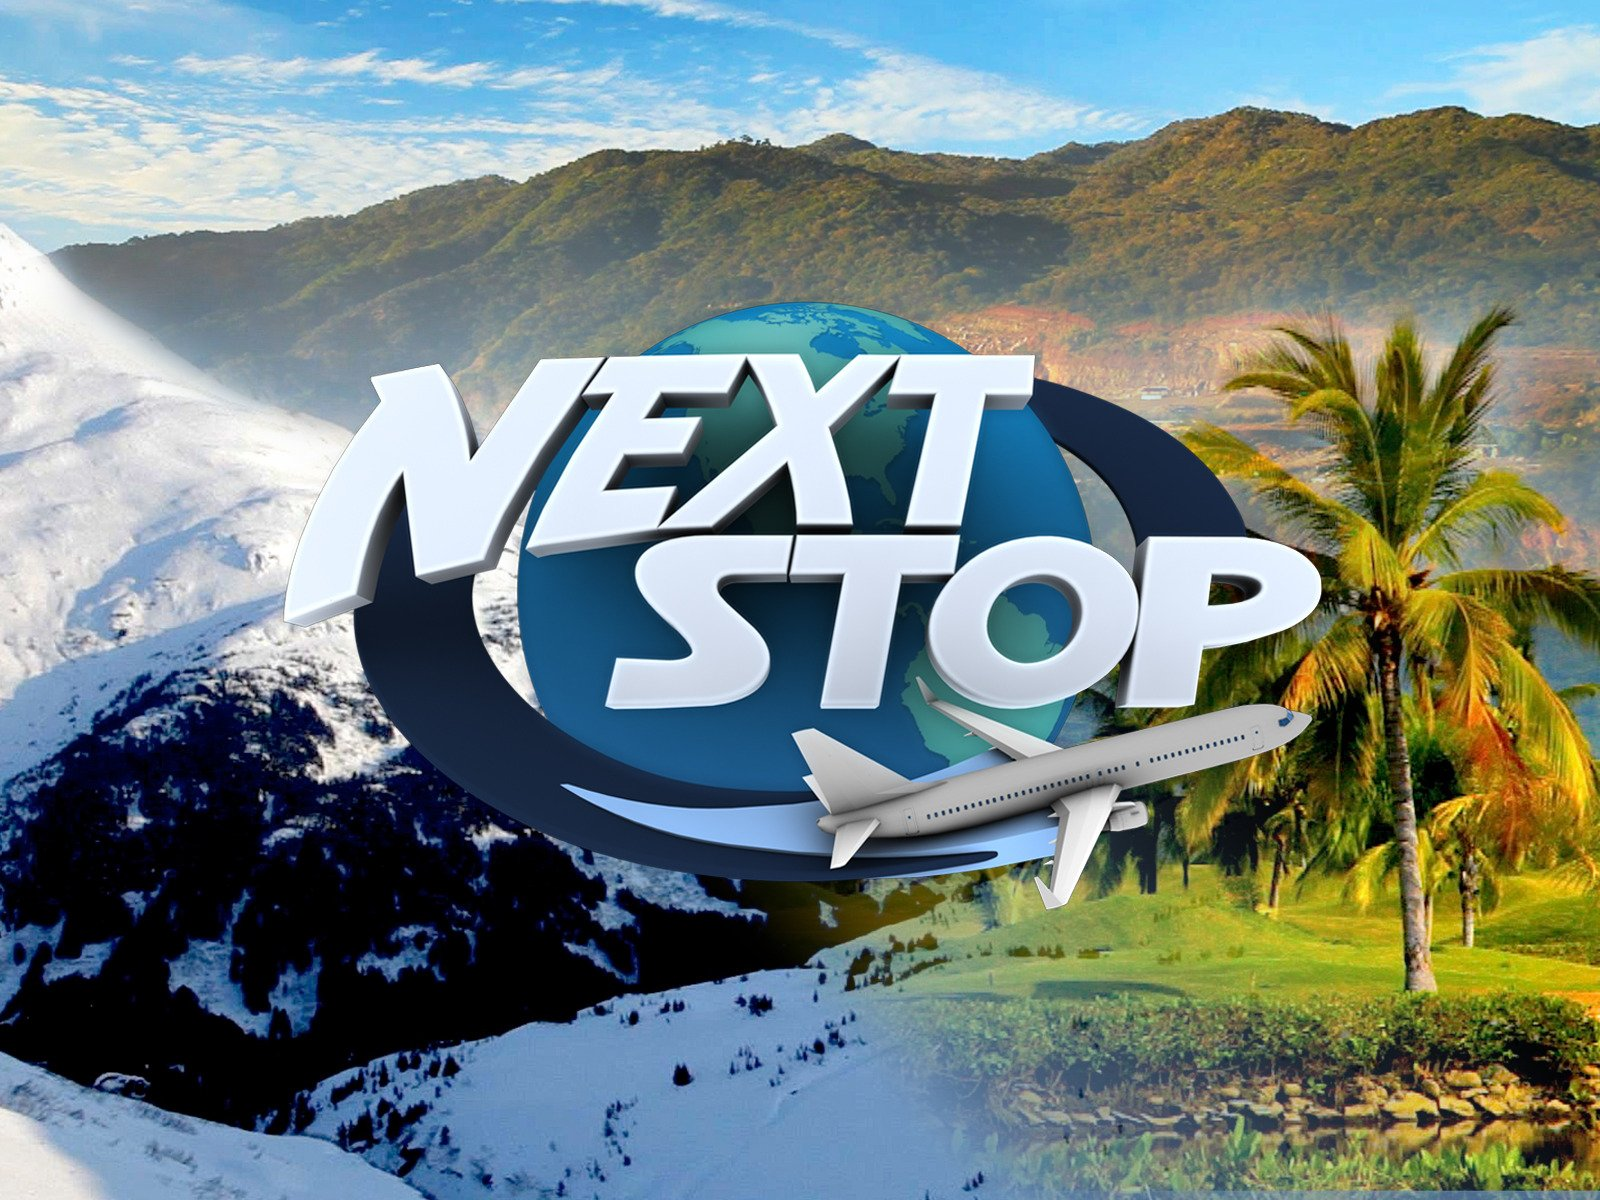 Next Stop - Season 1